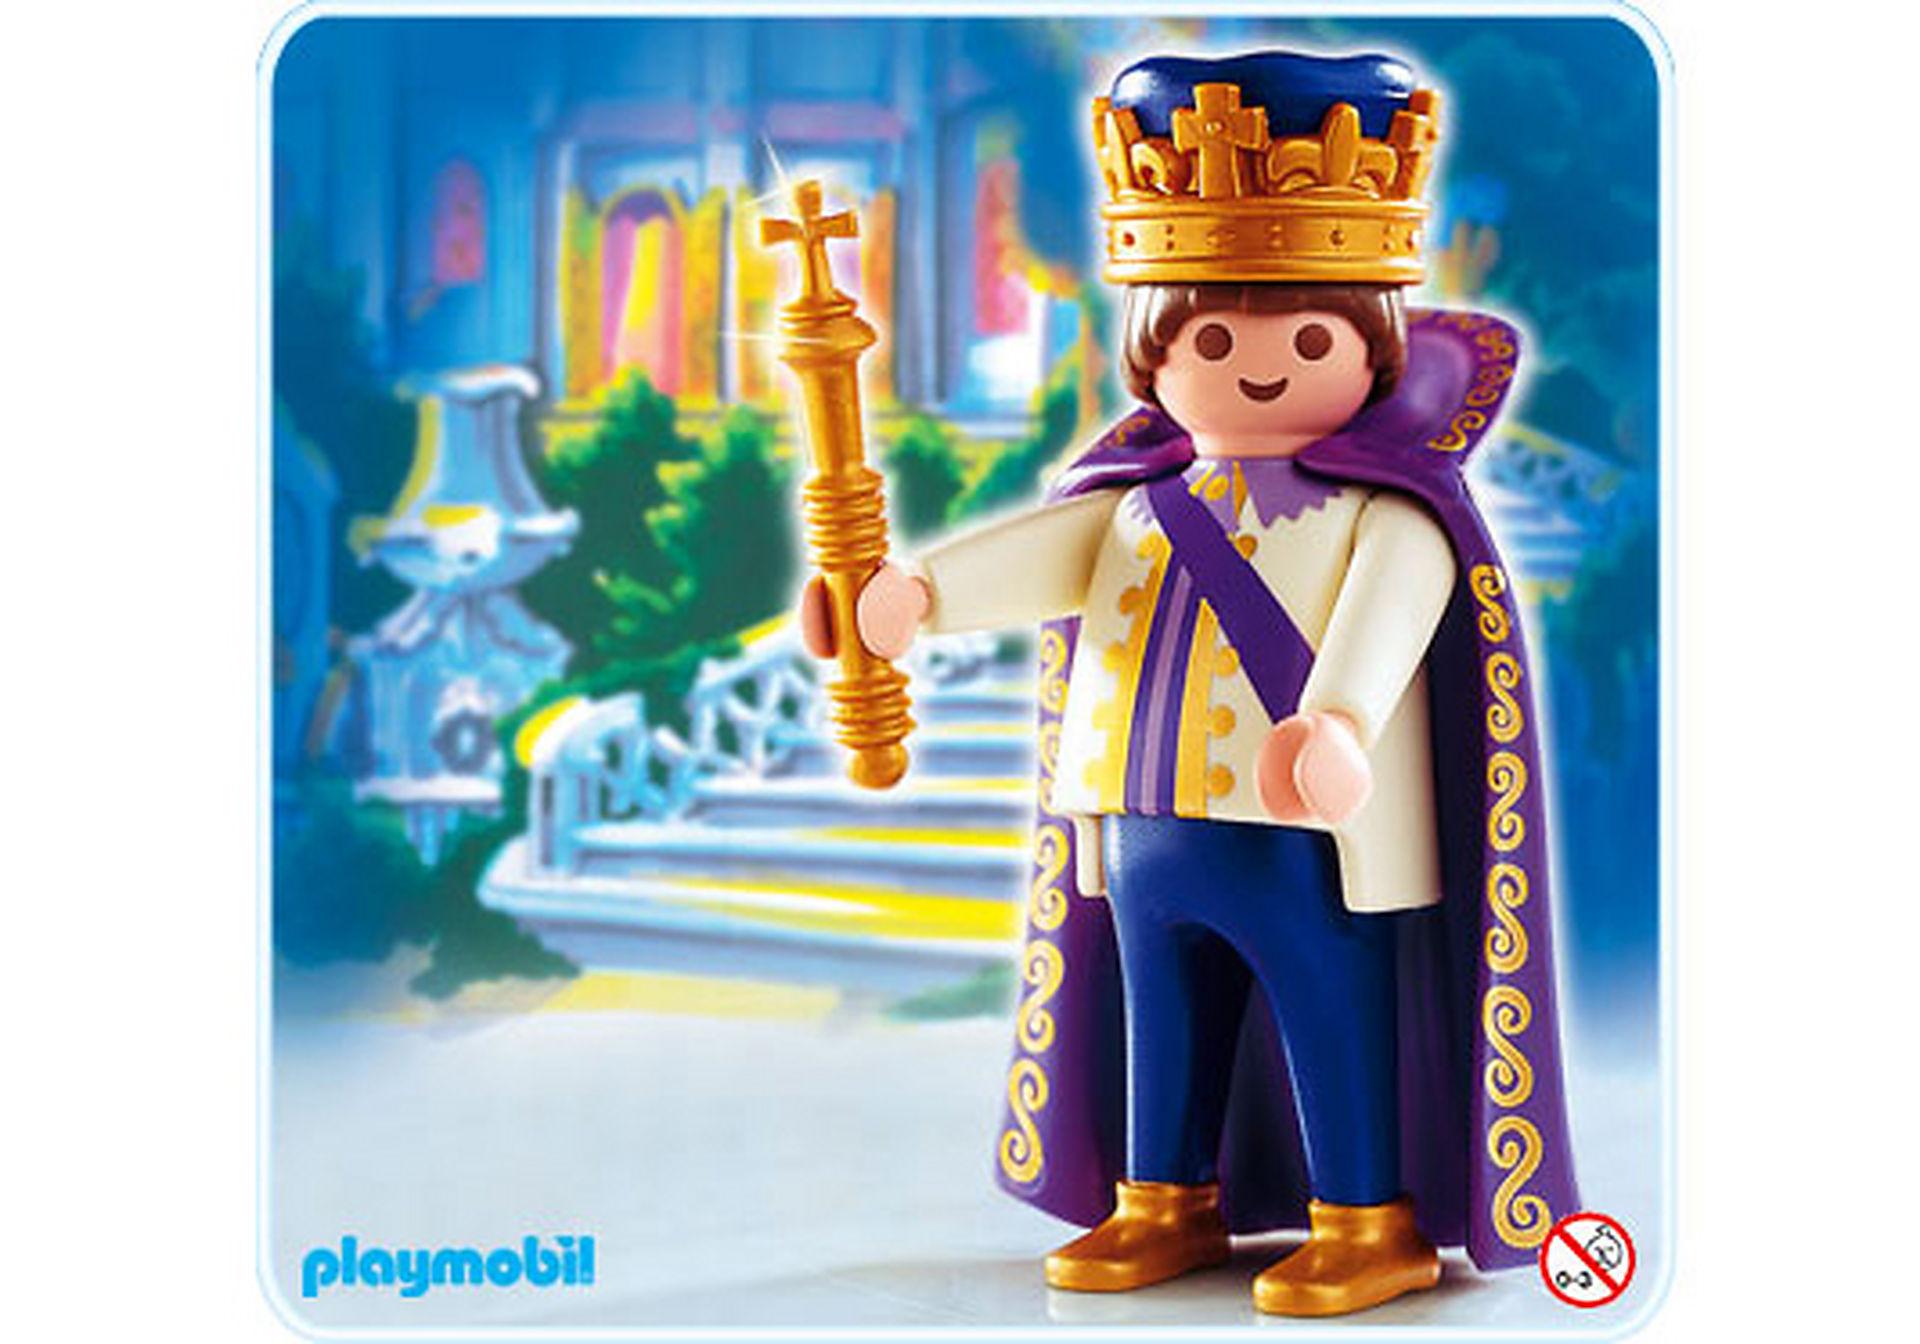 http://media.playmobil.com/i/playmobil/4663-A_product_detail/Roi / sceptre